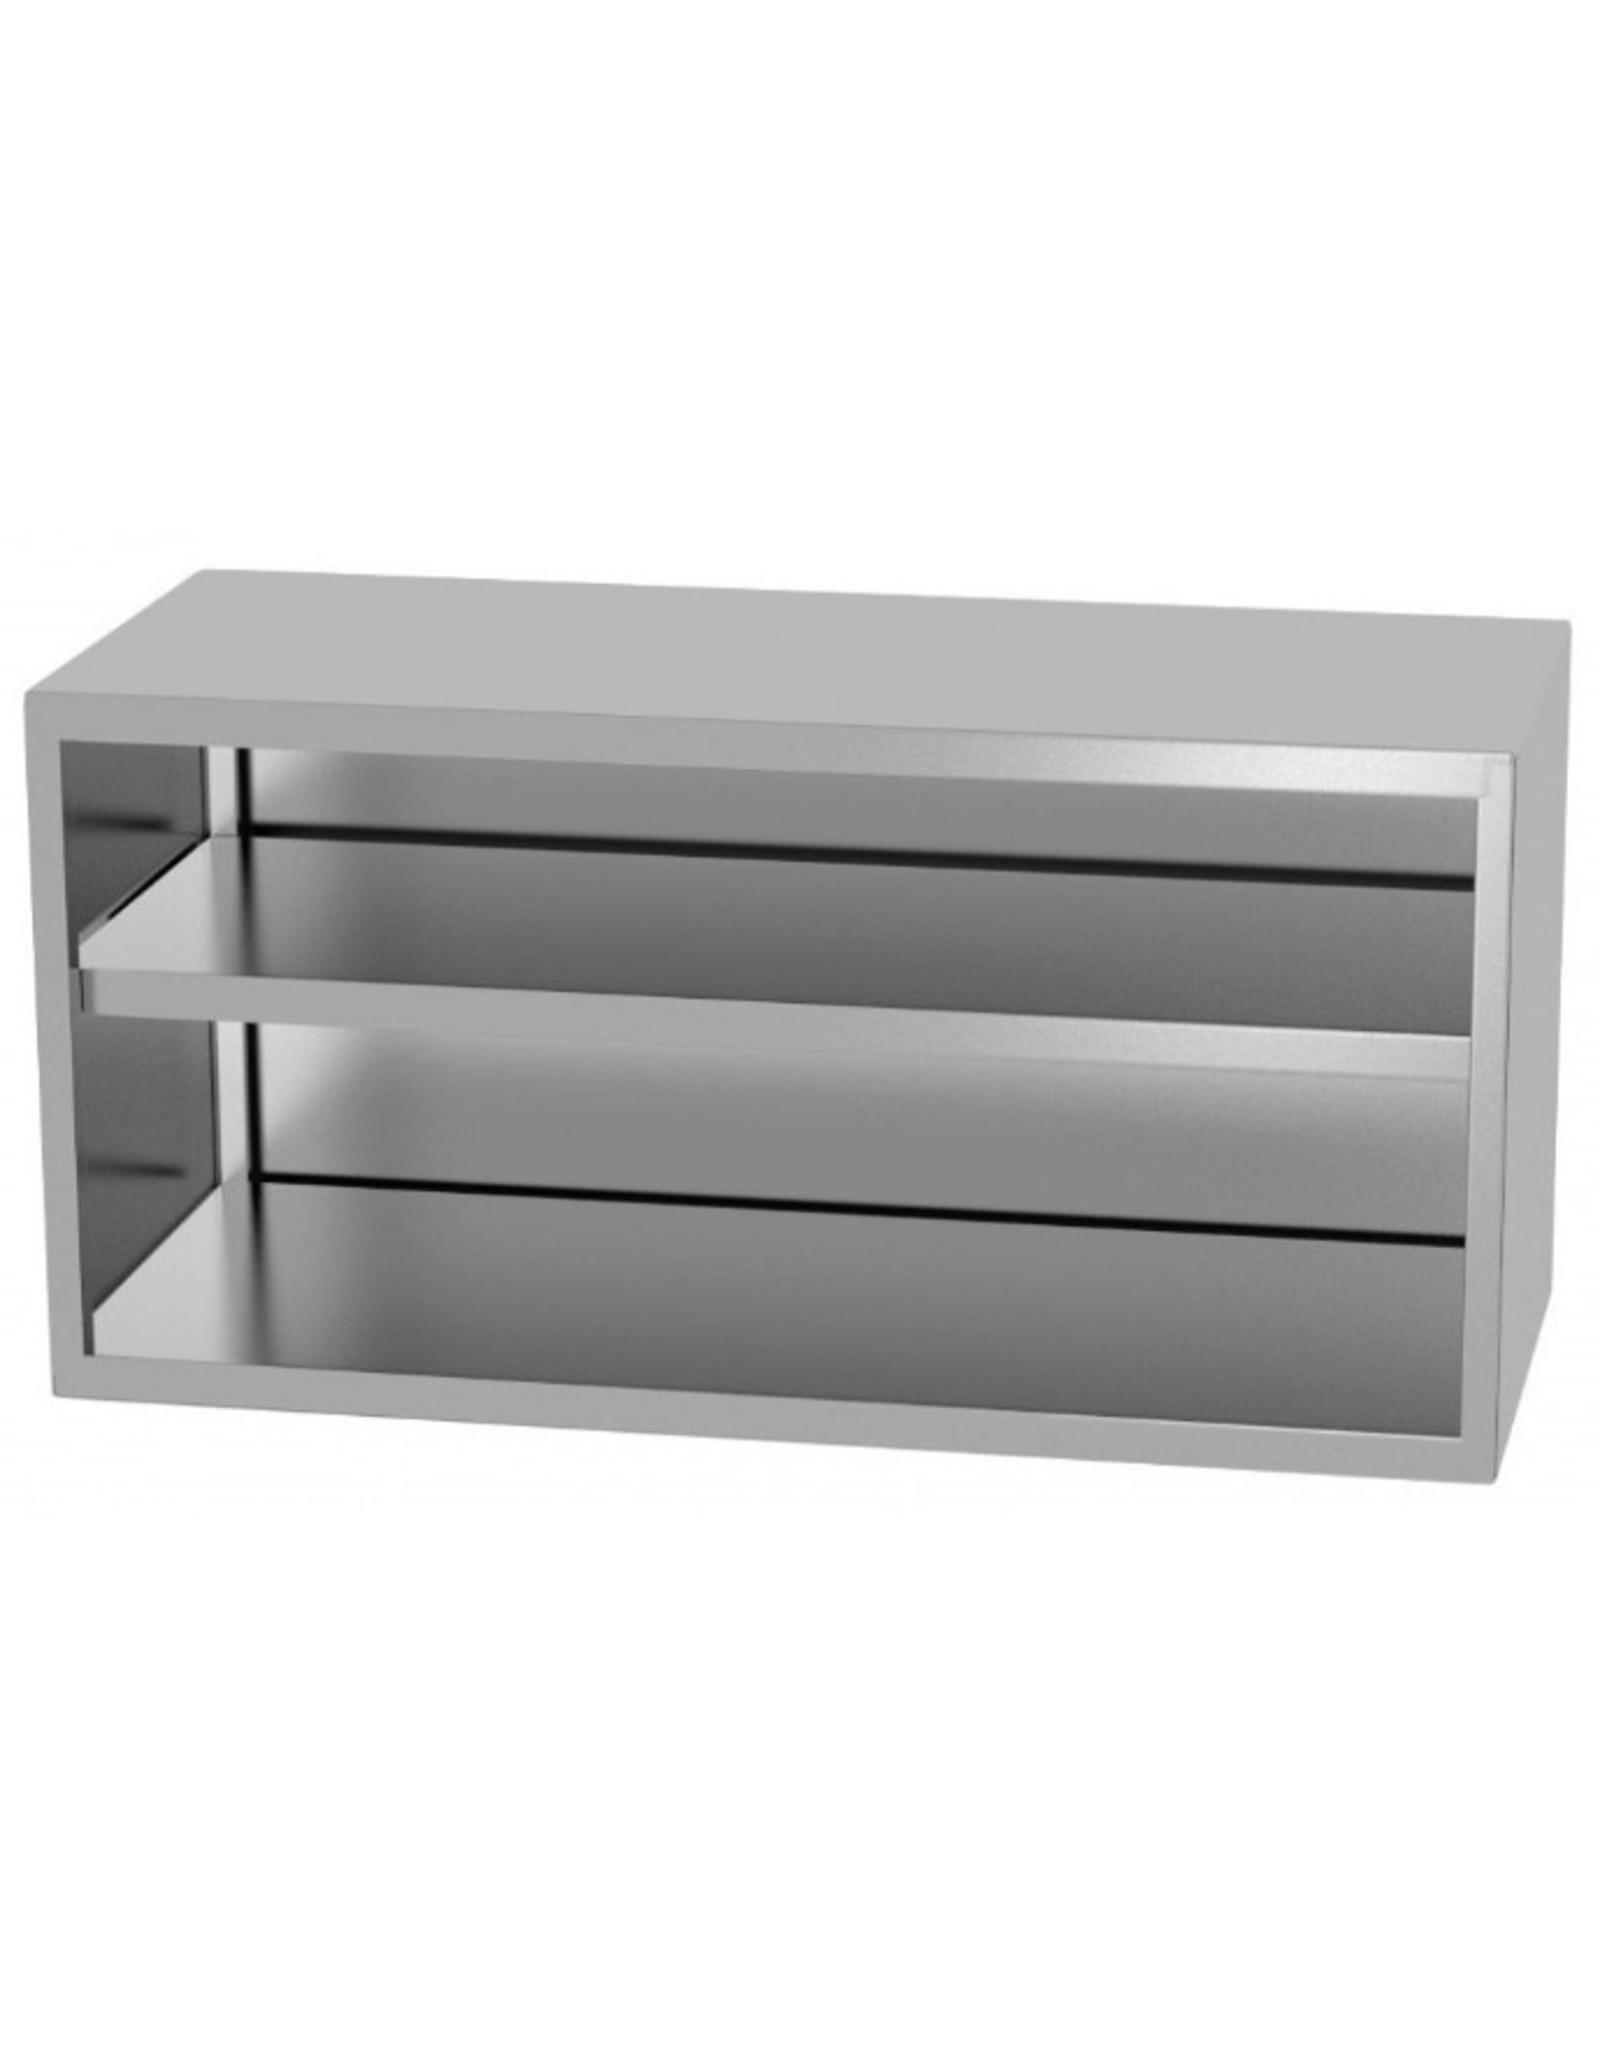 Wandkast | open model | 400-1600mm breed | 300 of 400mm diep | 600mm hoog